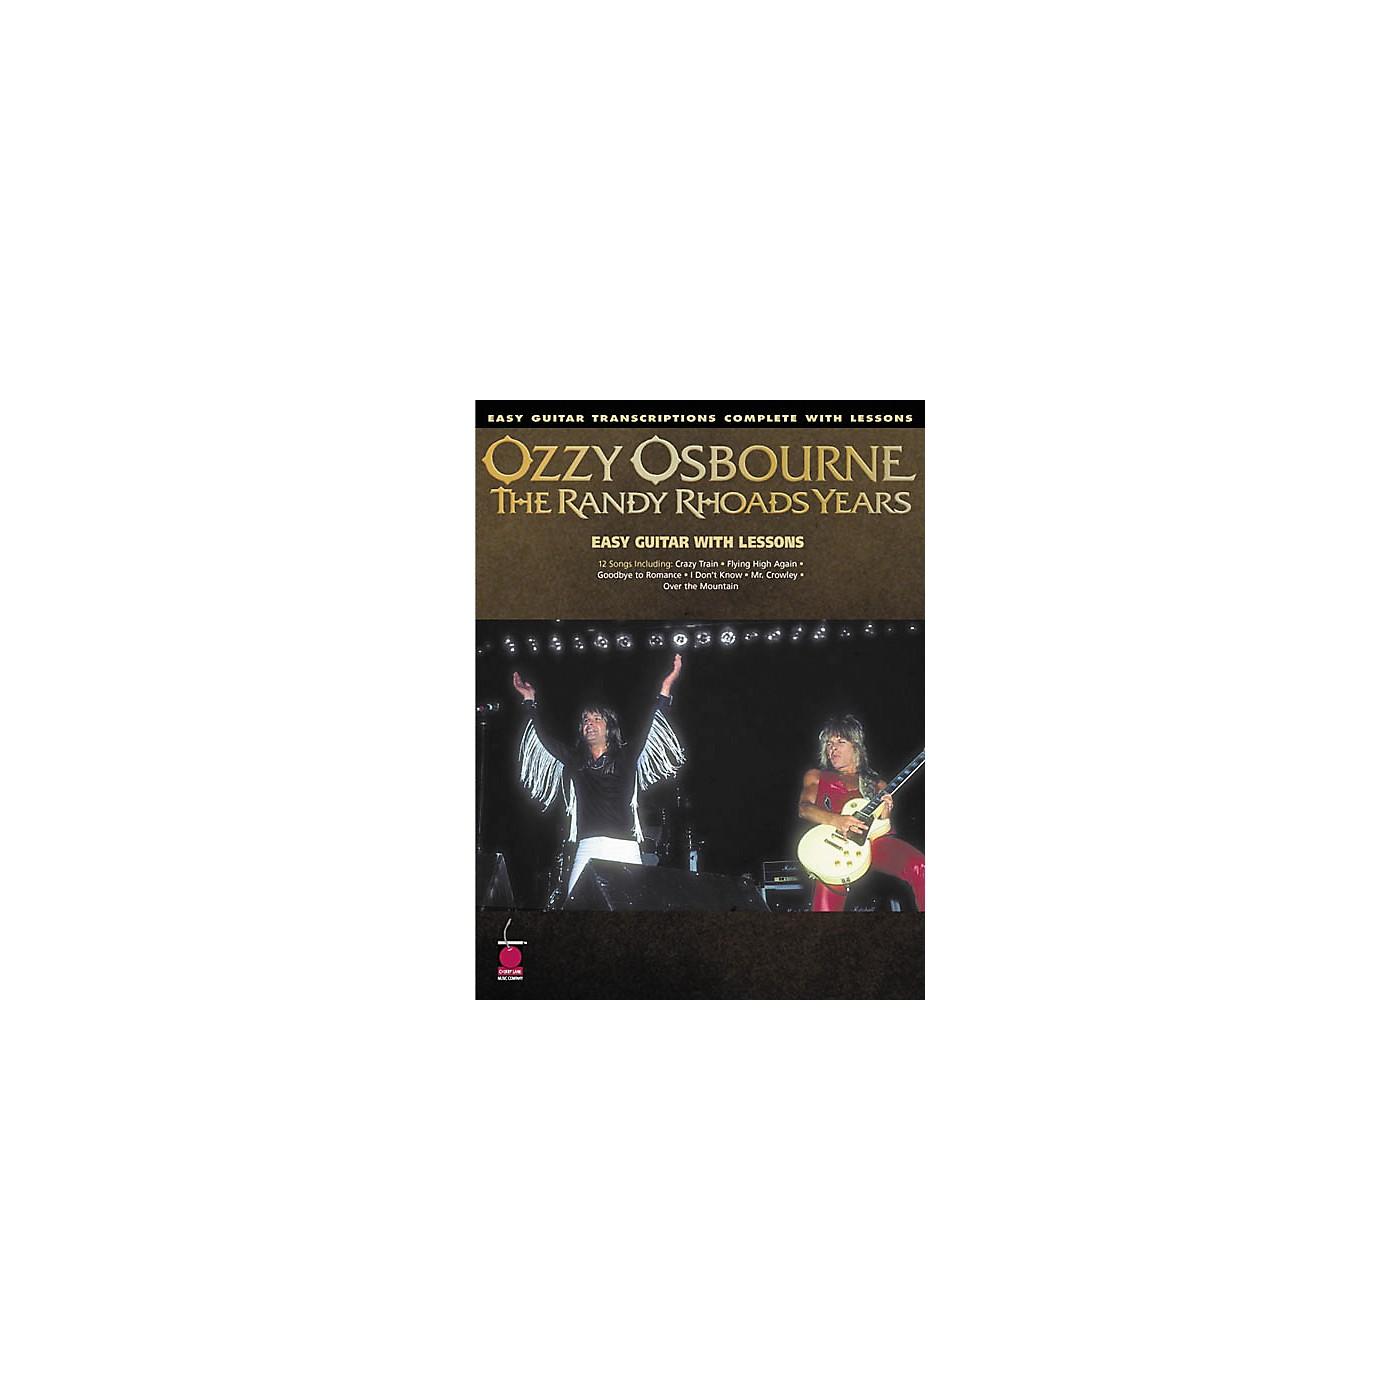 Cherry Lane Ozzy Osbourne - The Randy Rhoads Years Book thumbnail